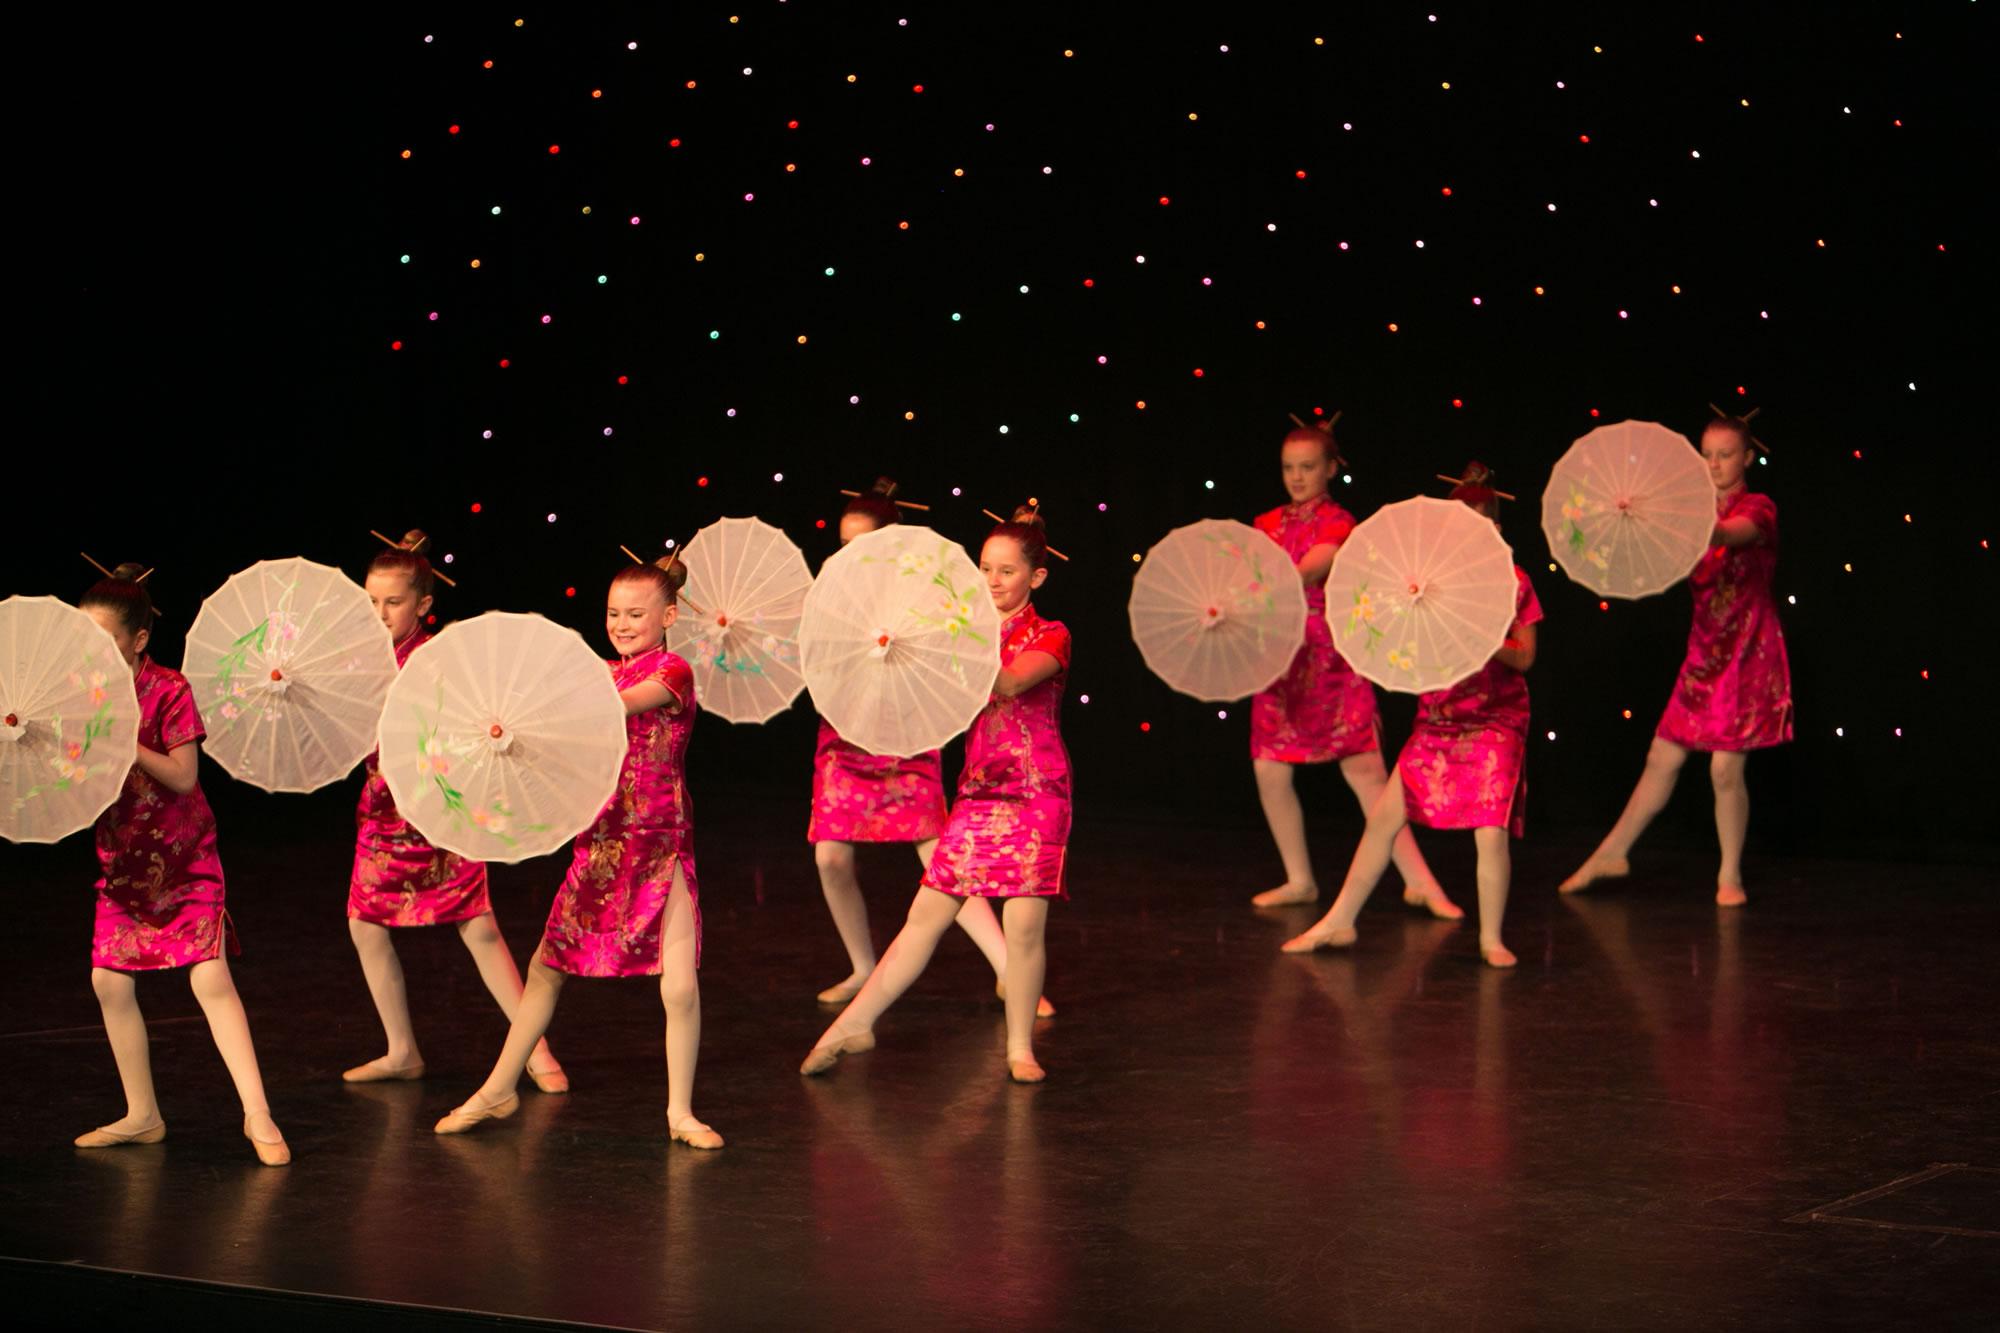 Hitchin_School_of_Dance_Show_2019-SM1_2396.jpg